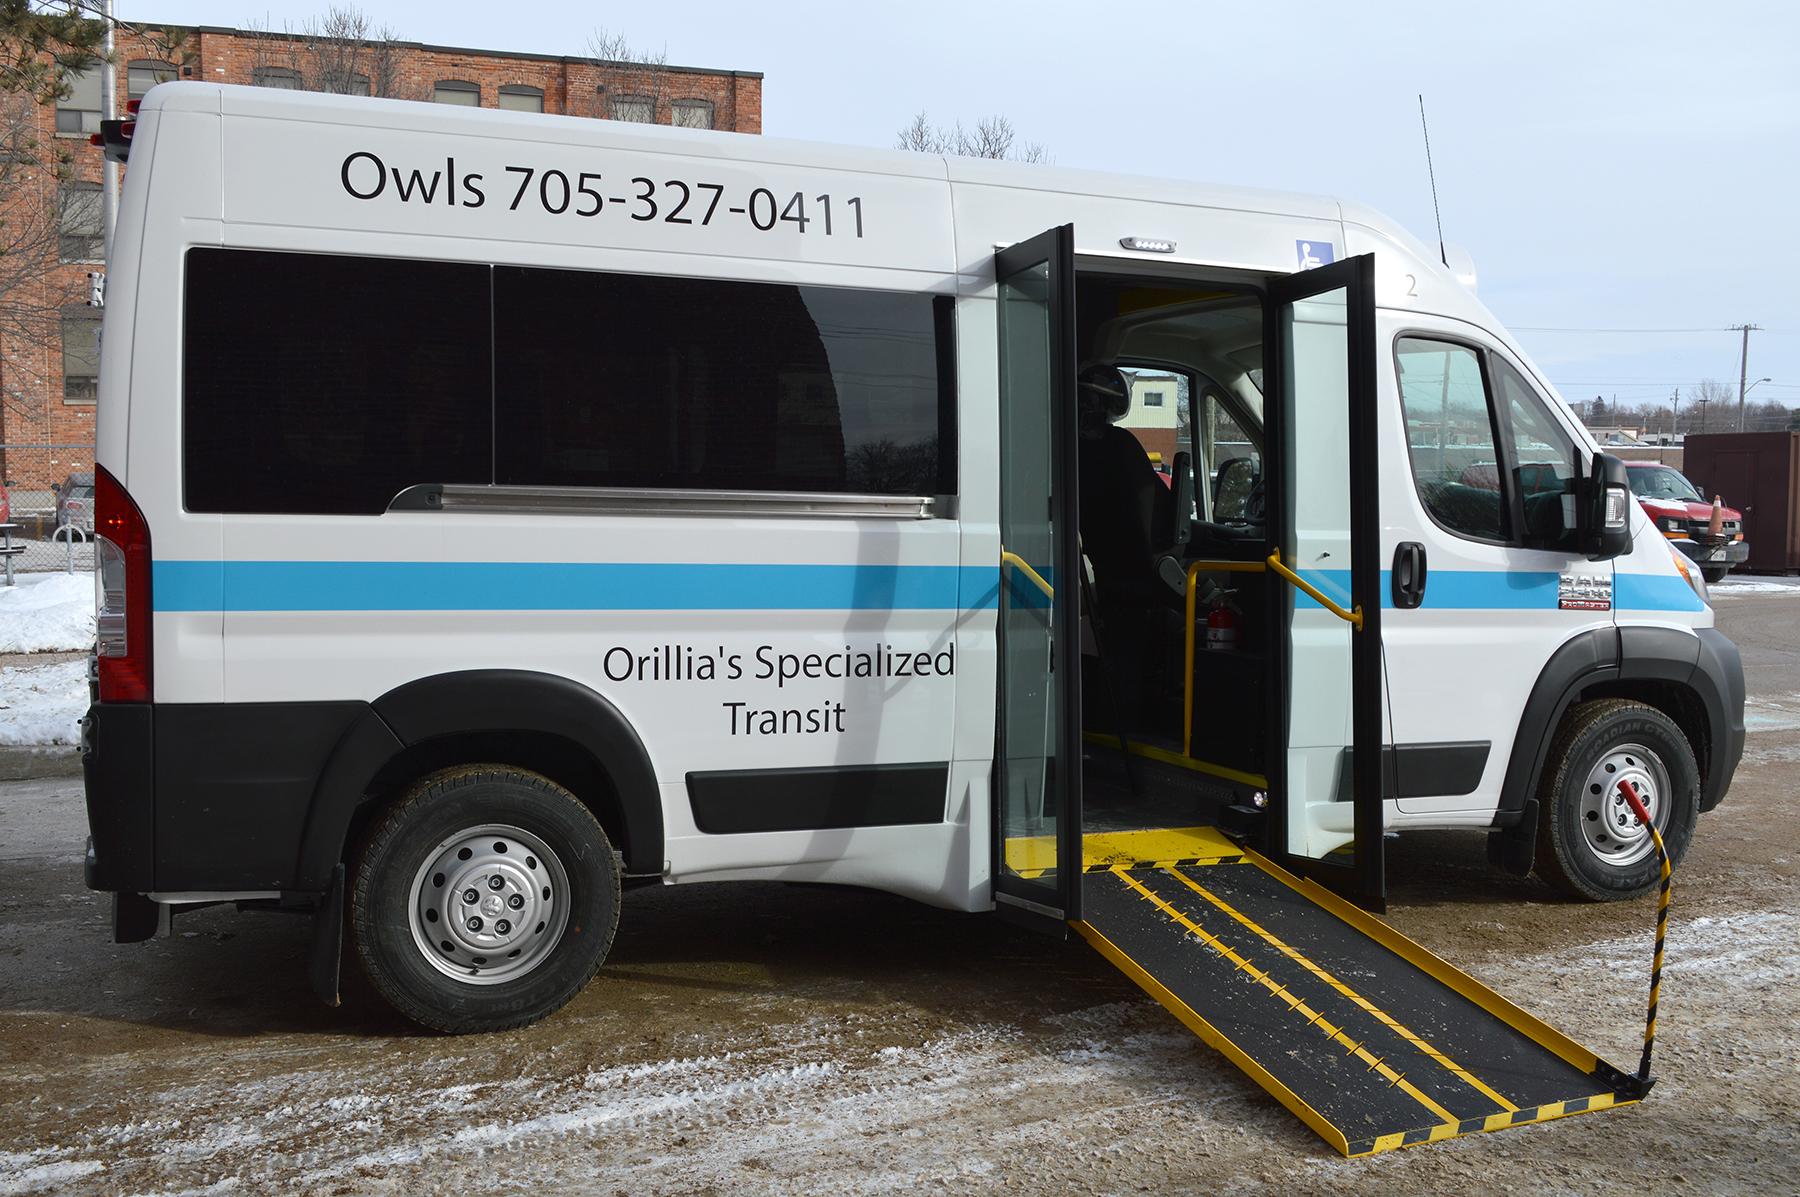 OWLS bus